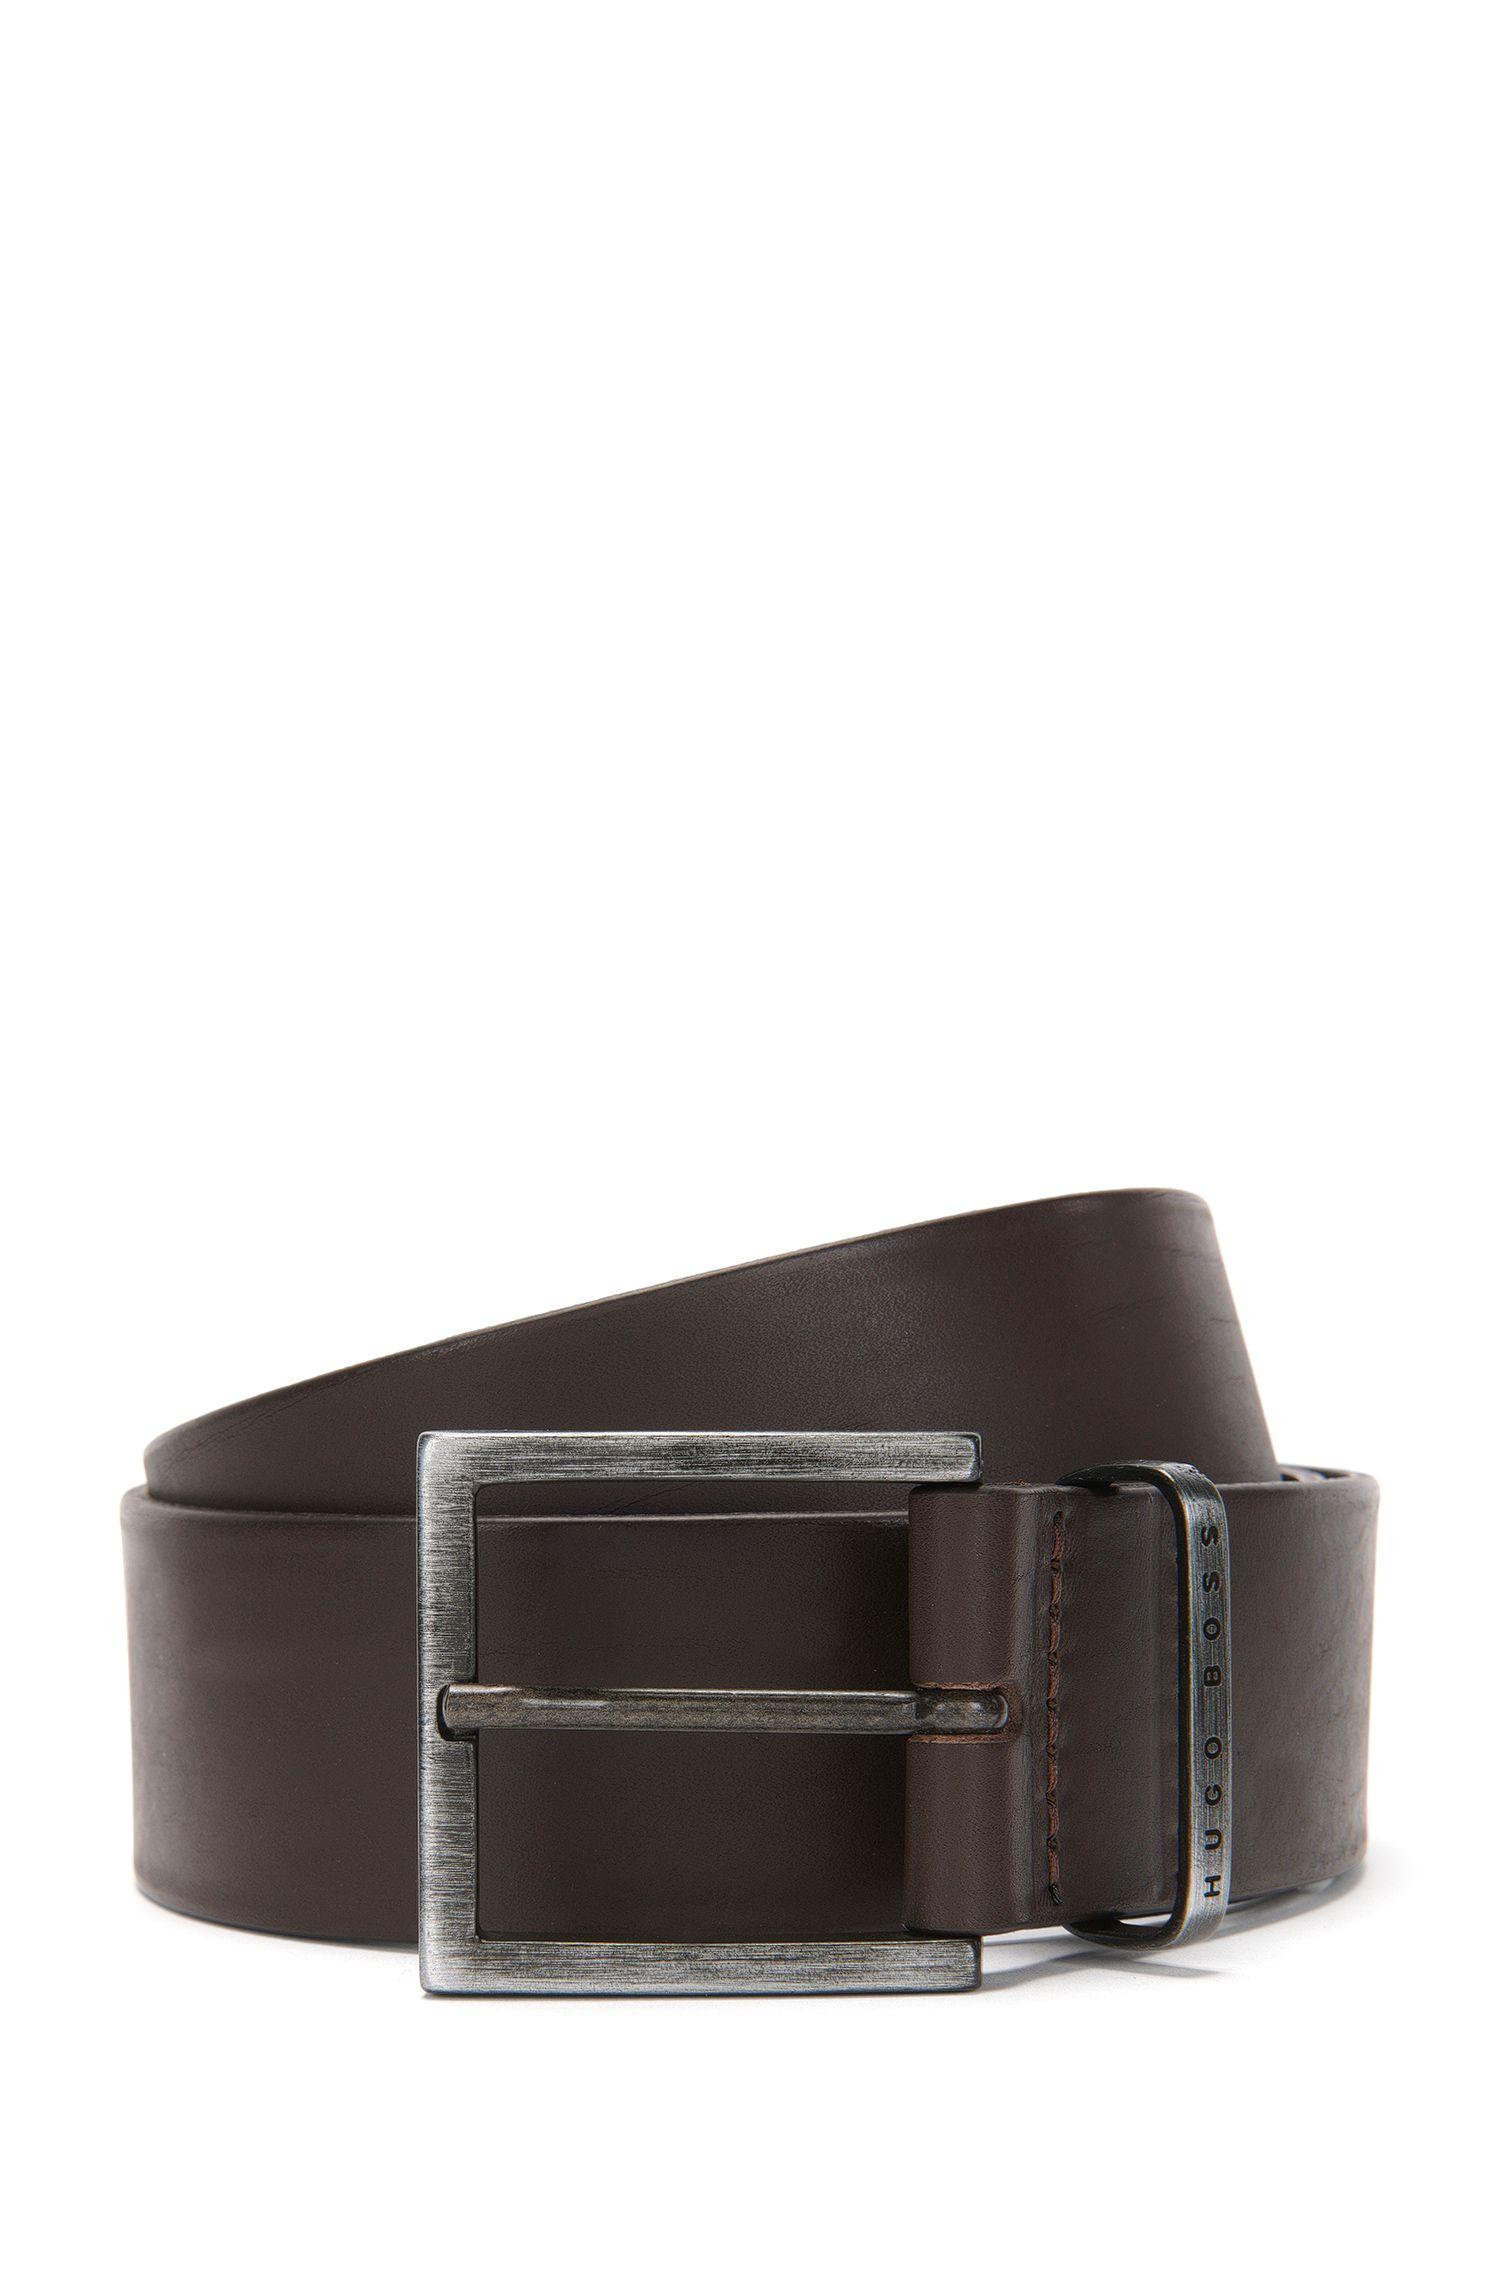 Leather Brushed Buckle Belt | Scott Sz40 ltpl